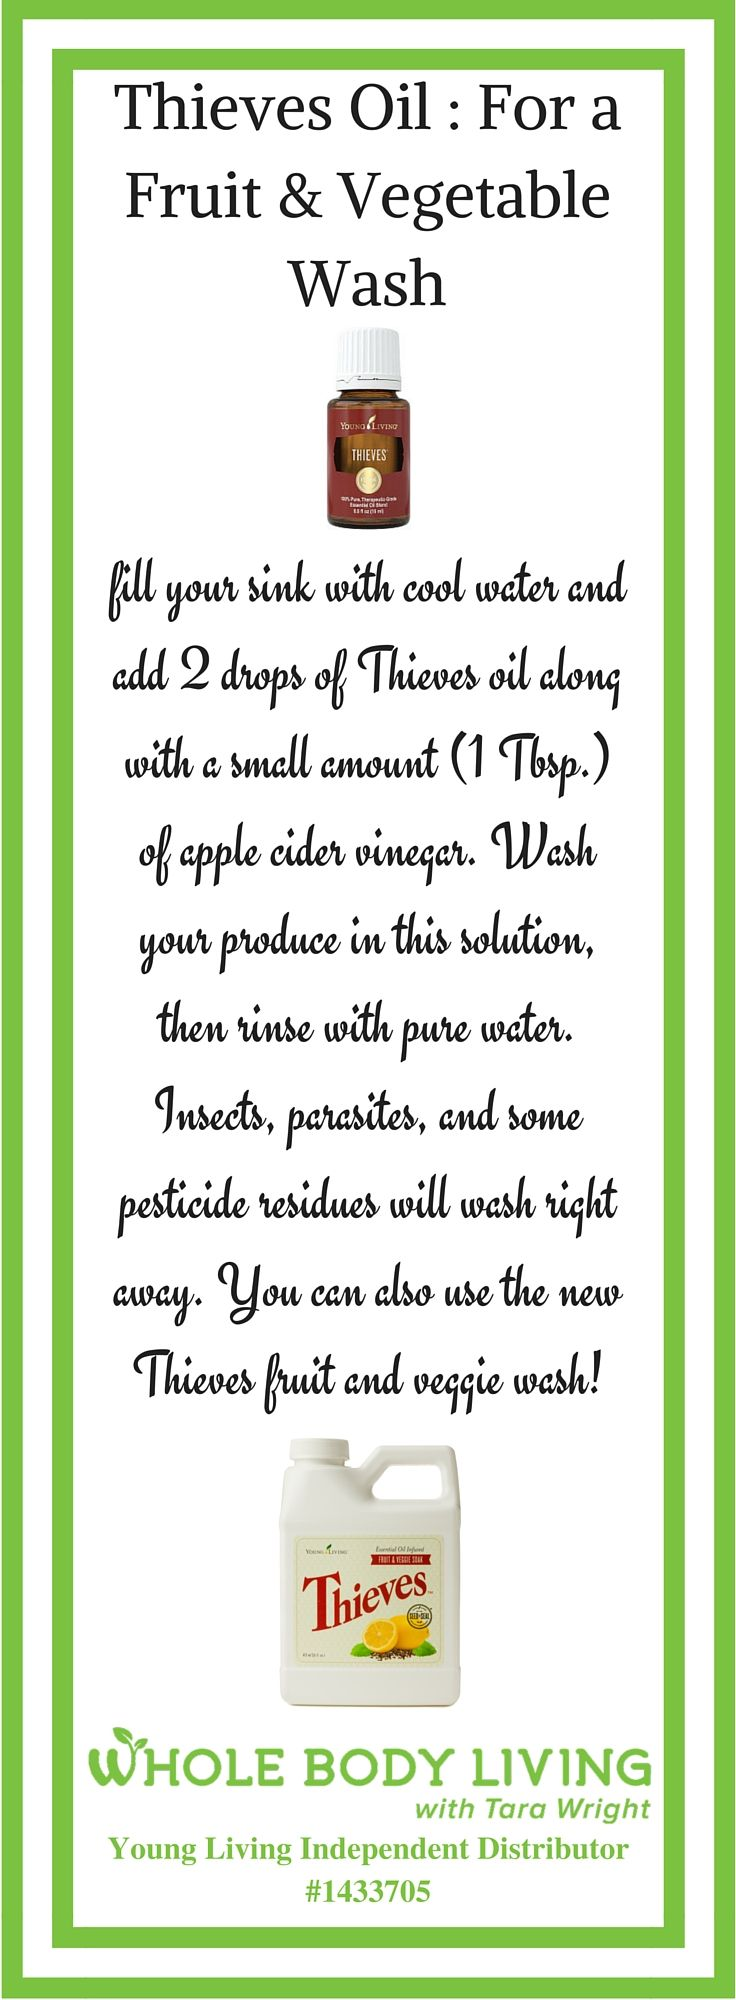 Thieves Oil : Fruit & Vegetable Wash - http://wholebodyliving.com/thieves-oil-fruit-vegetable-wash/ -Whole Body Living-#AppleCider, #Diy, #EssentialOils, #Fruit, #HomeCleaner, #Natural, #NonToxic, #Thieves, #Vegetable, #YoungLiving Thieves Fruit & Veggie Soak  - https://www.youngliving.com/en_US/products/item/5352/?sponsorid=1433705&enrollerid=1433705&type=member